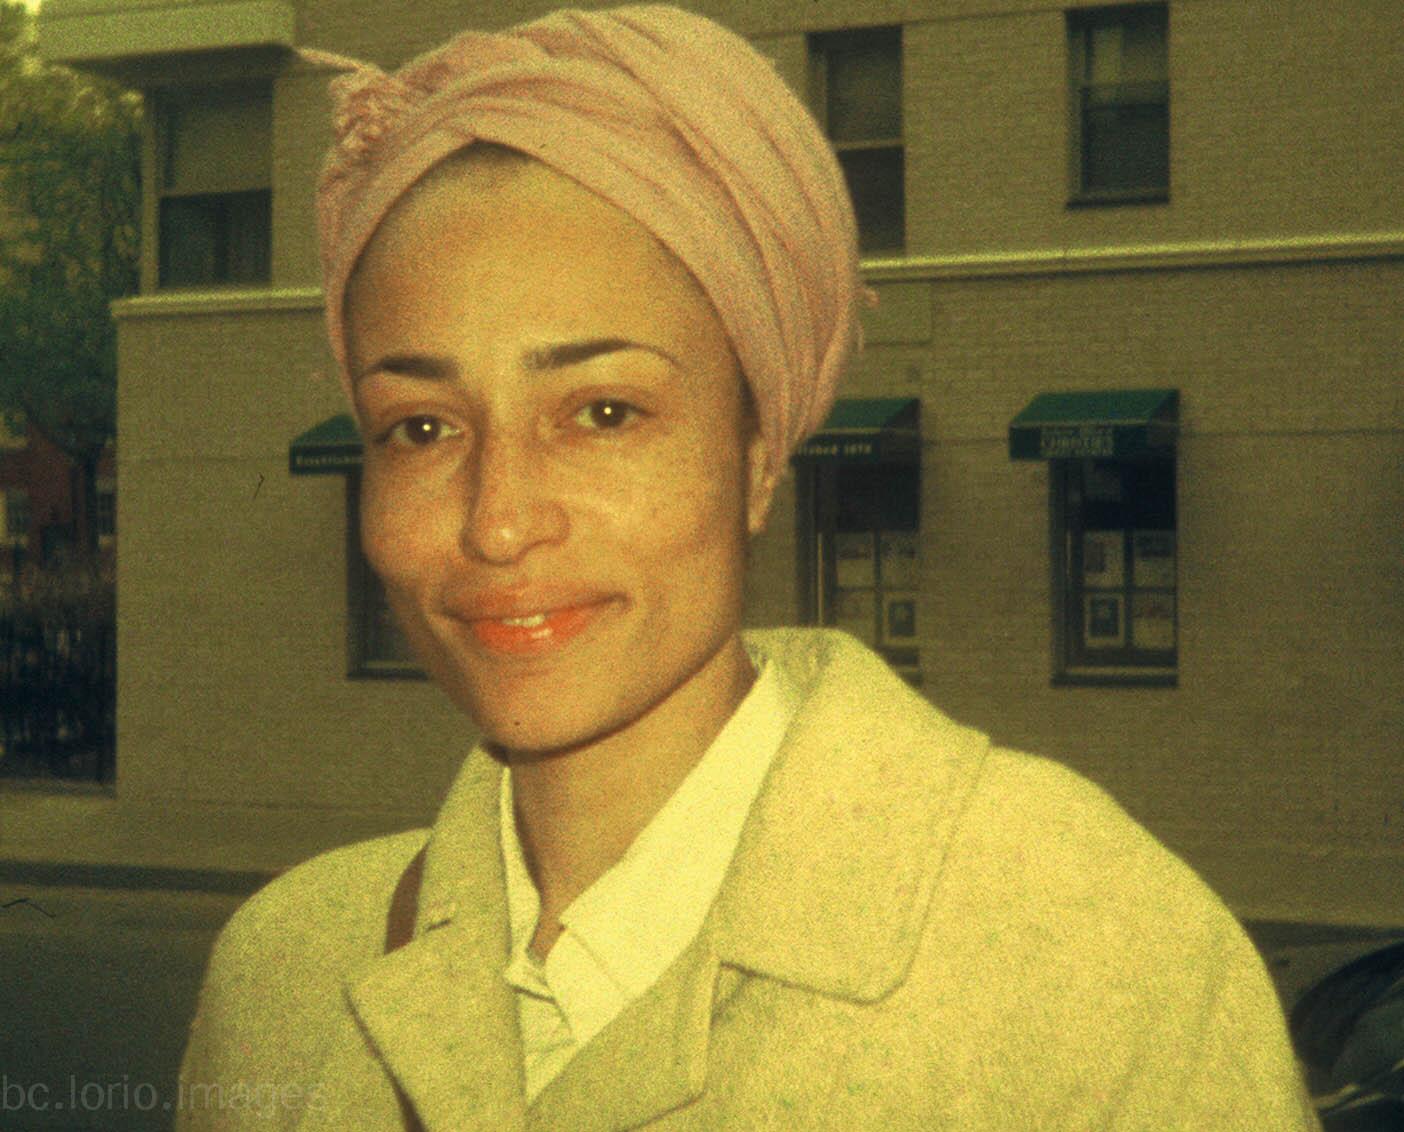 Zadie Smith in New York. Source: Flickr / B.C. Lorio